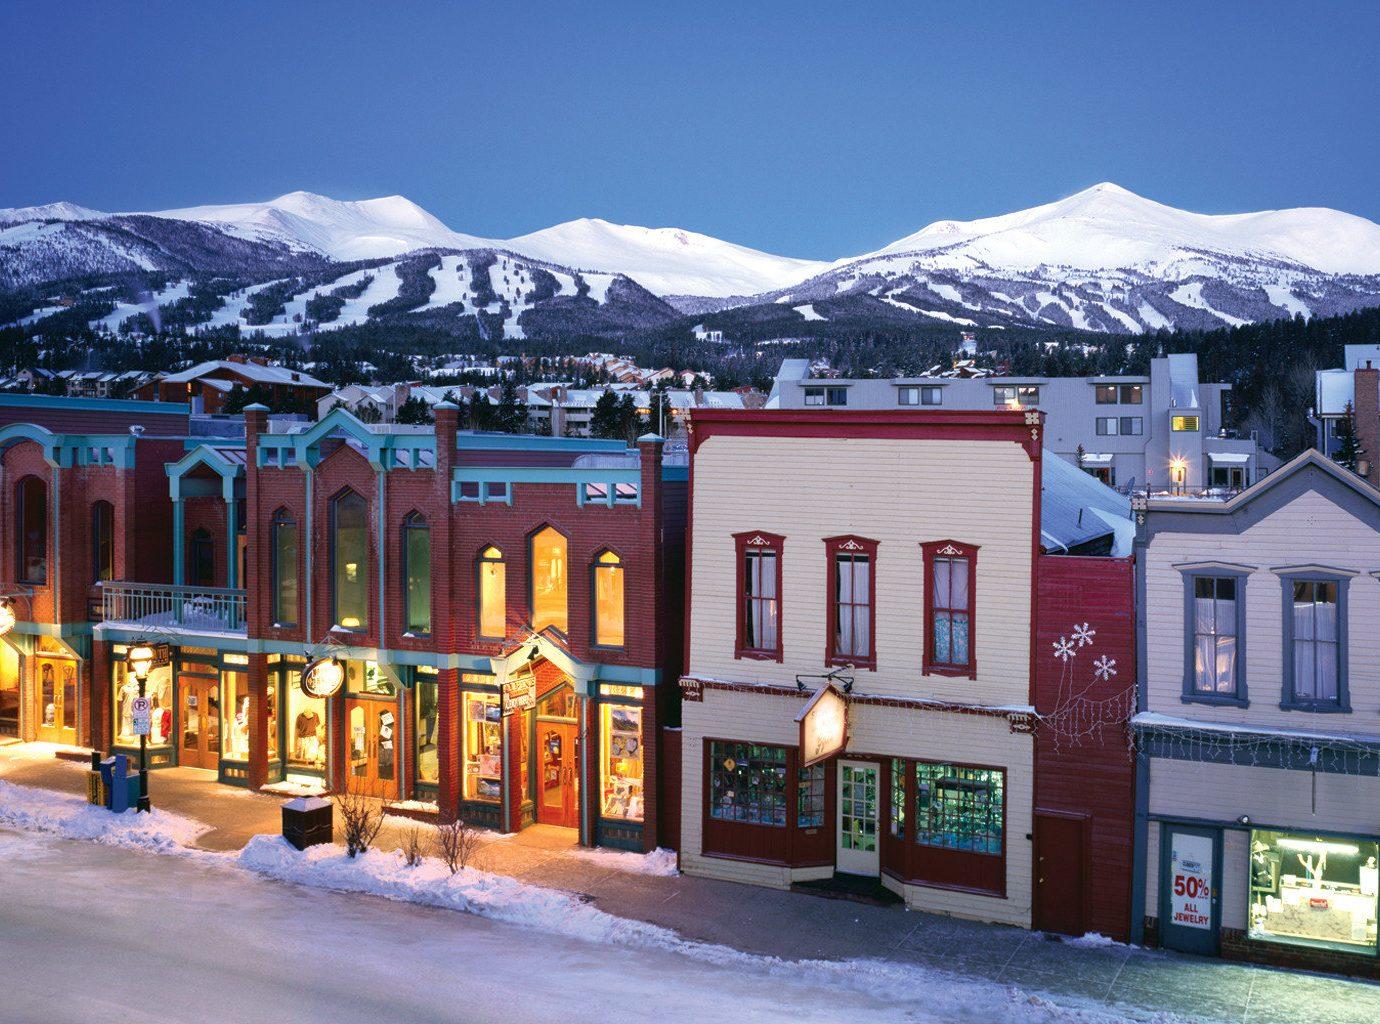 Lodge Outdoor Activities Romantic Ski Trip Ideas snow sky outdoor Town Winter mountain season vacation Resort